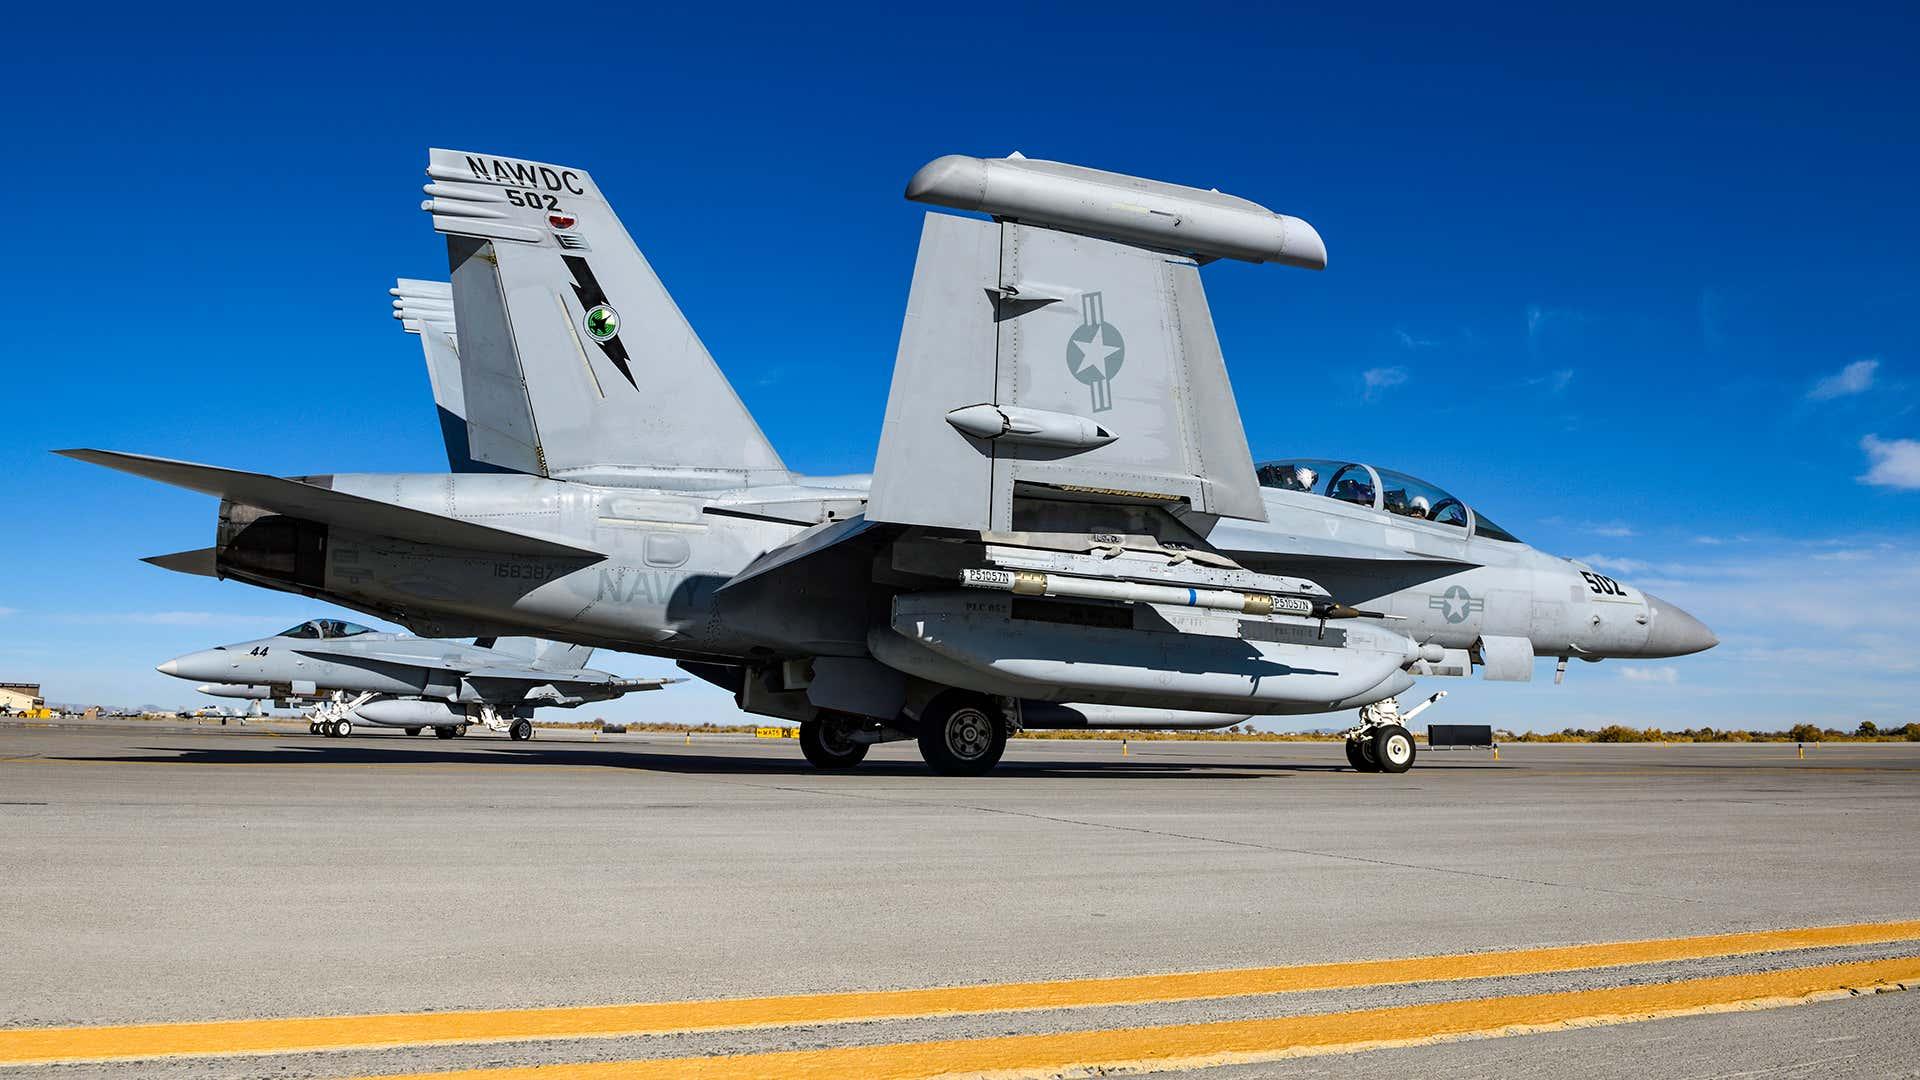 U.S. Navy E/A-18G Growler • Carrier-Based Electronic Warfare Aircraft • Checkered Flag 21-2